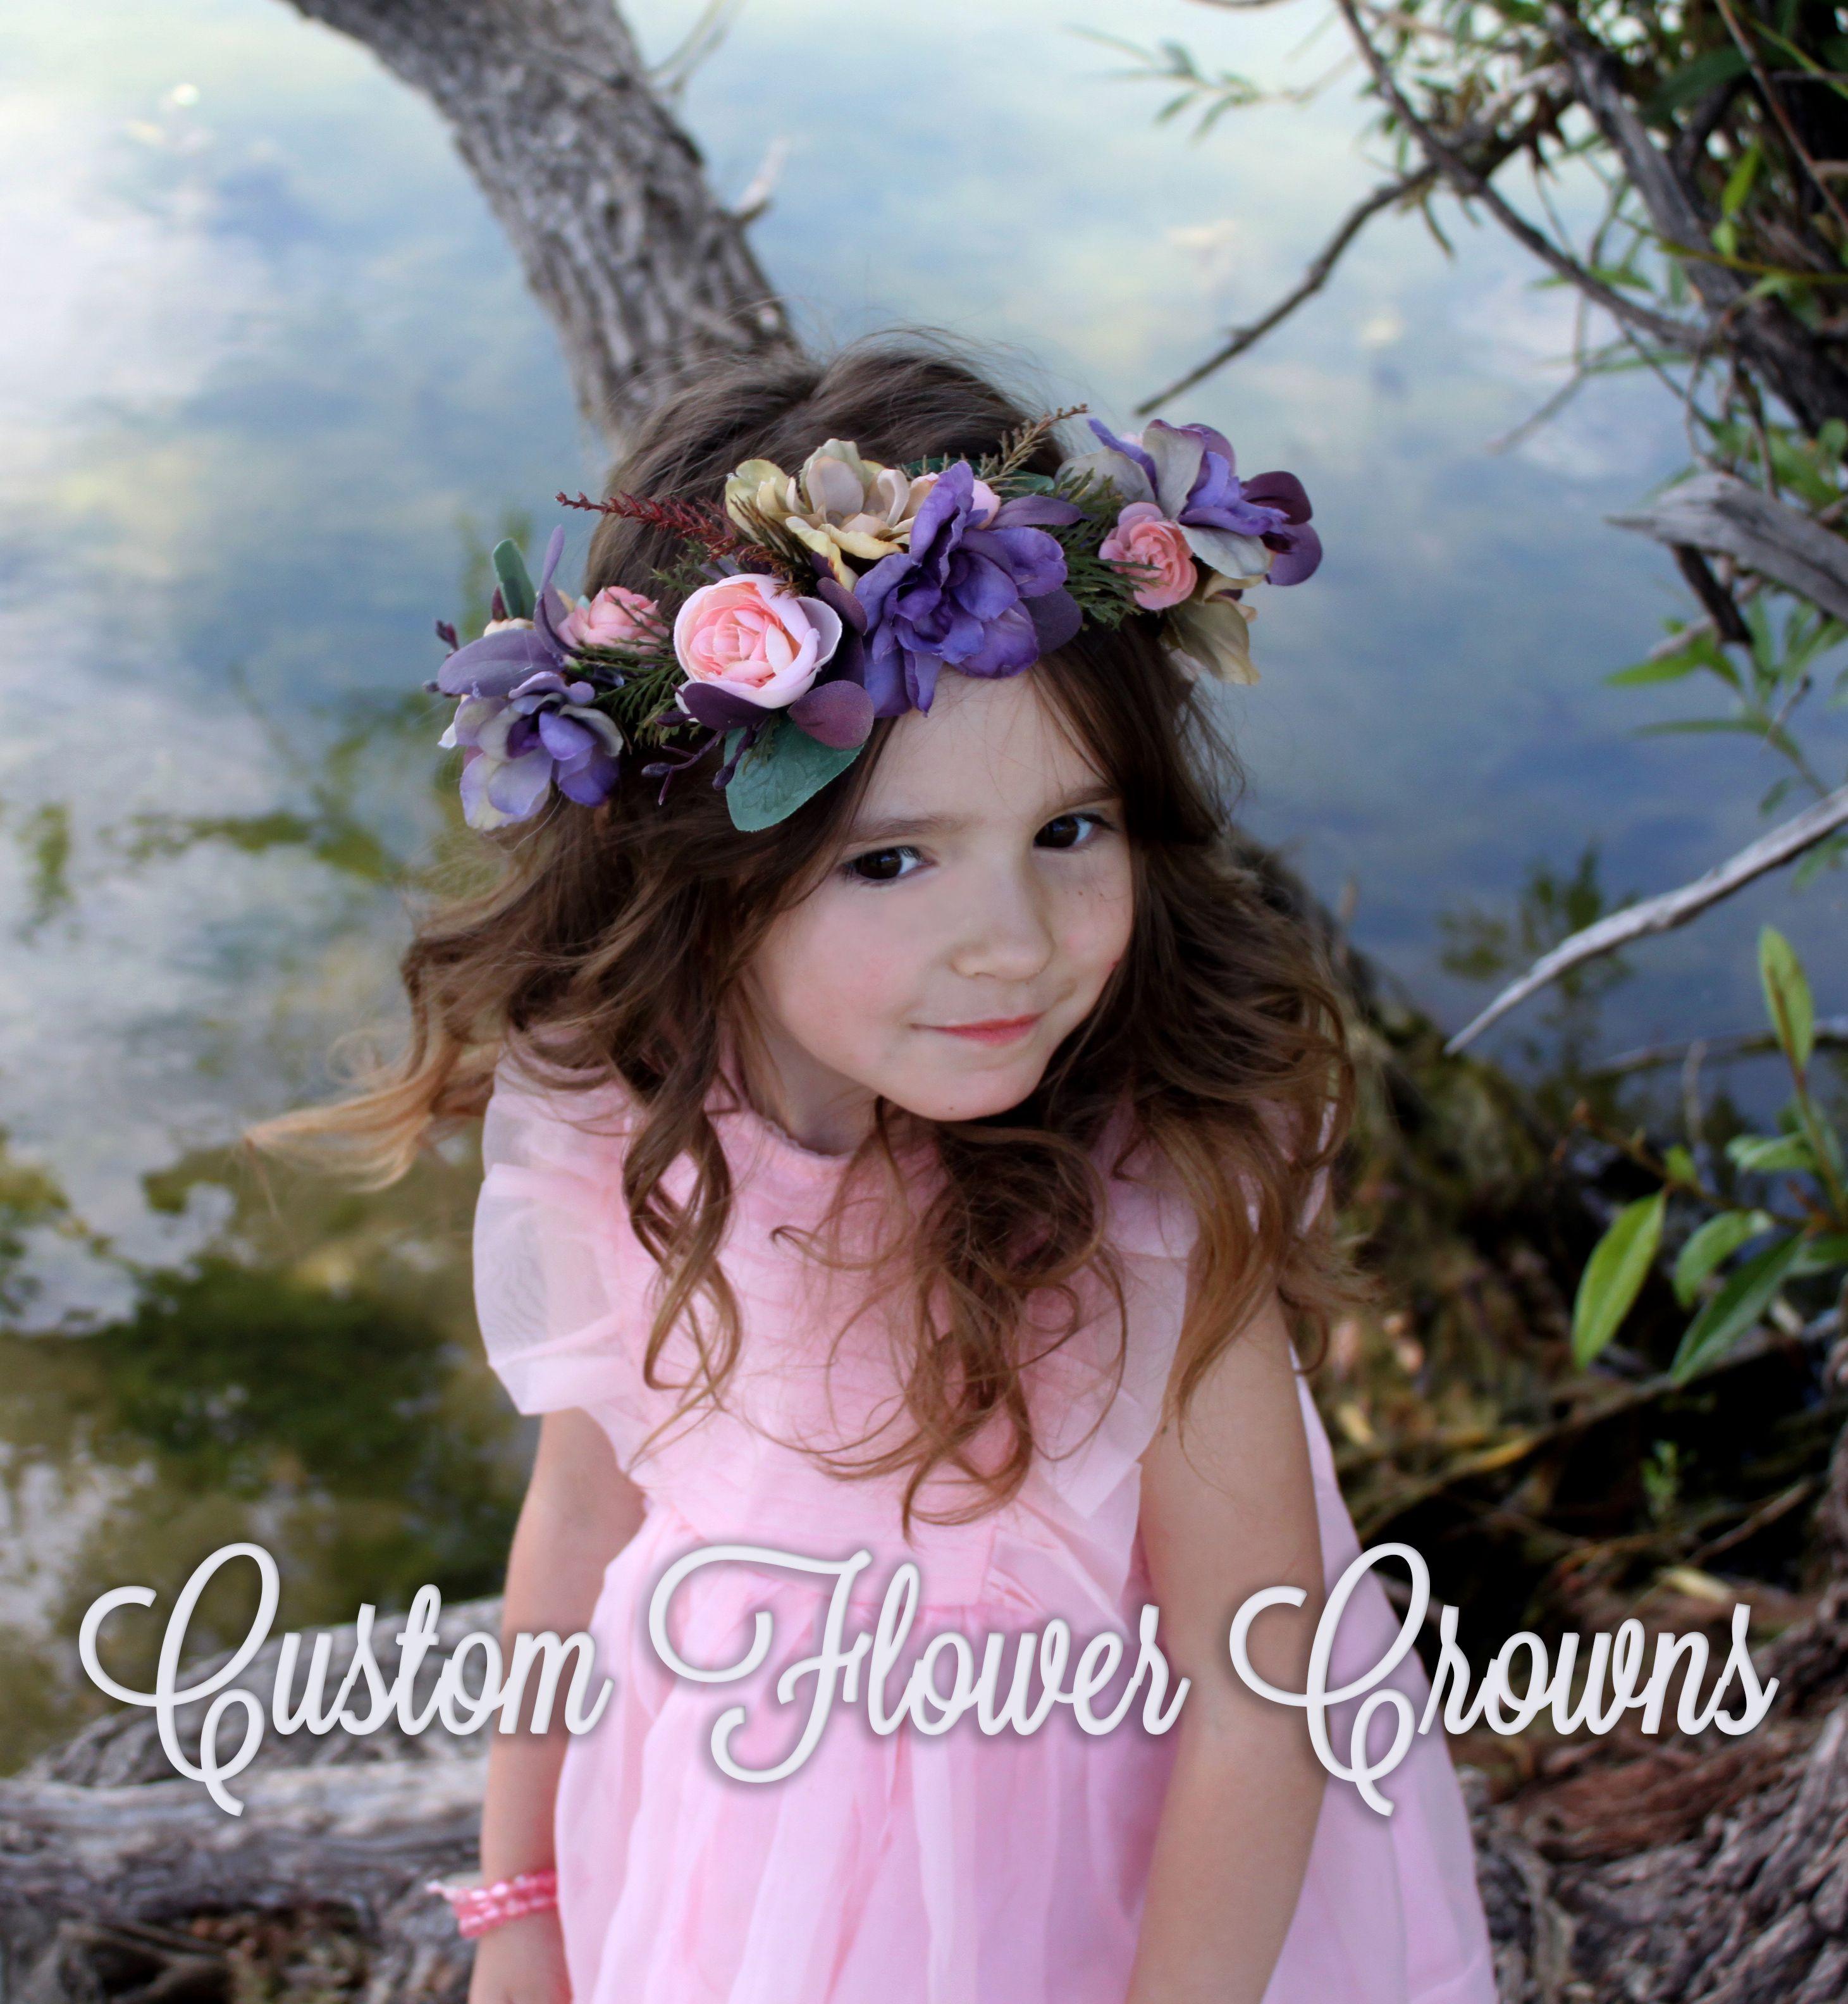 Flower Crown Etsy Custom Floral Wreath Childs Hair Flower